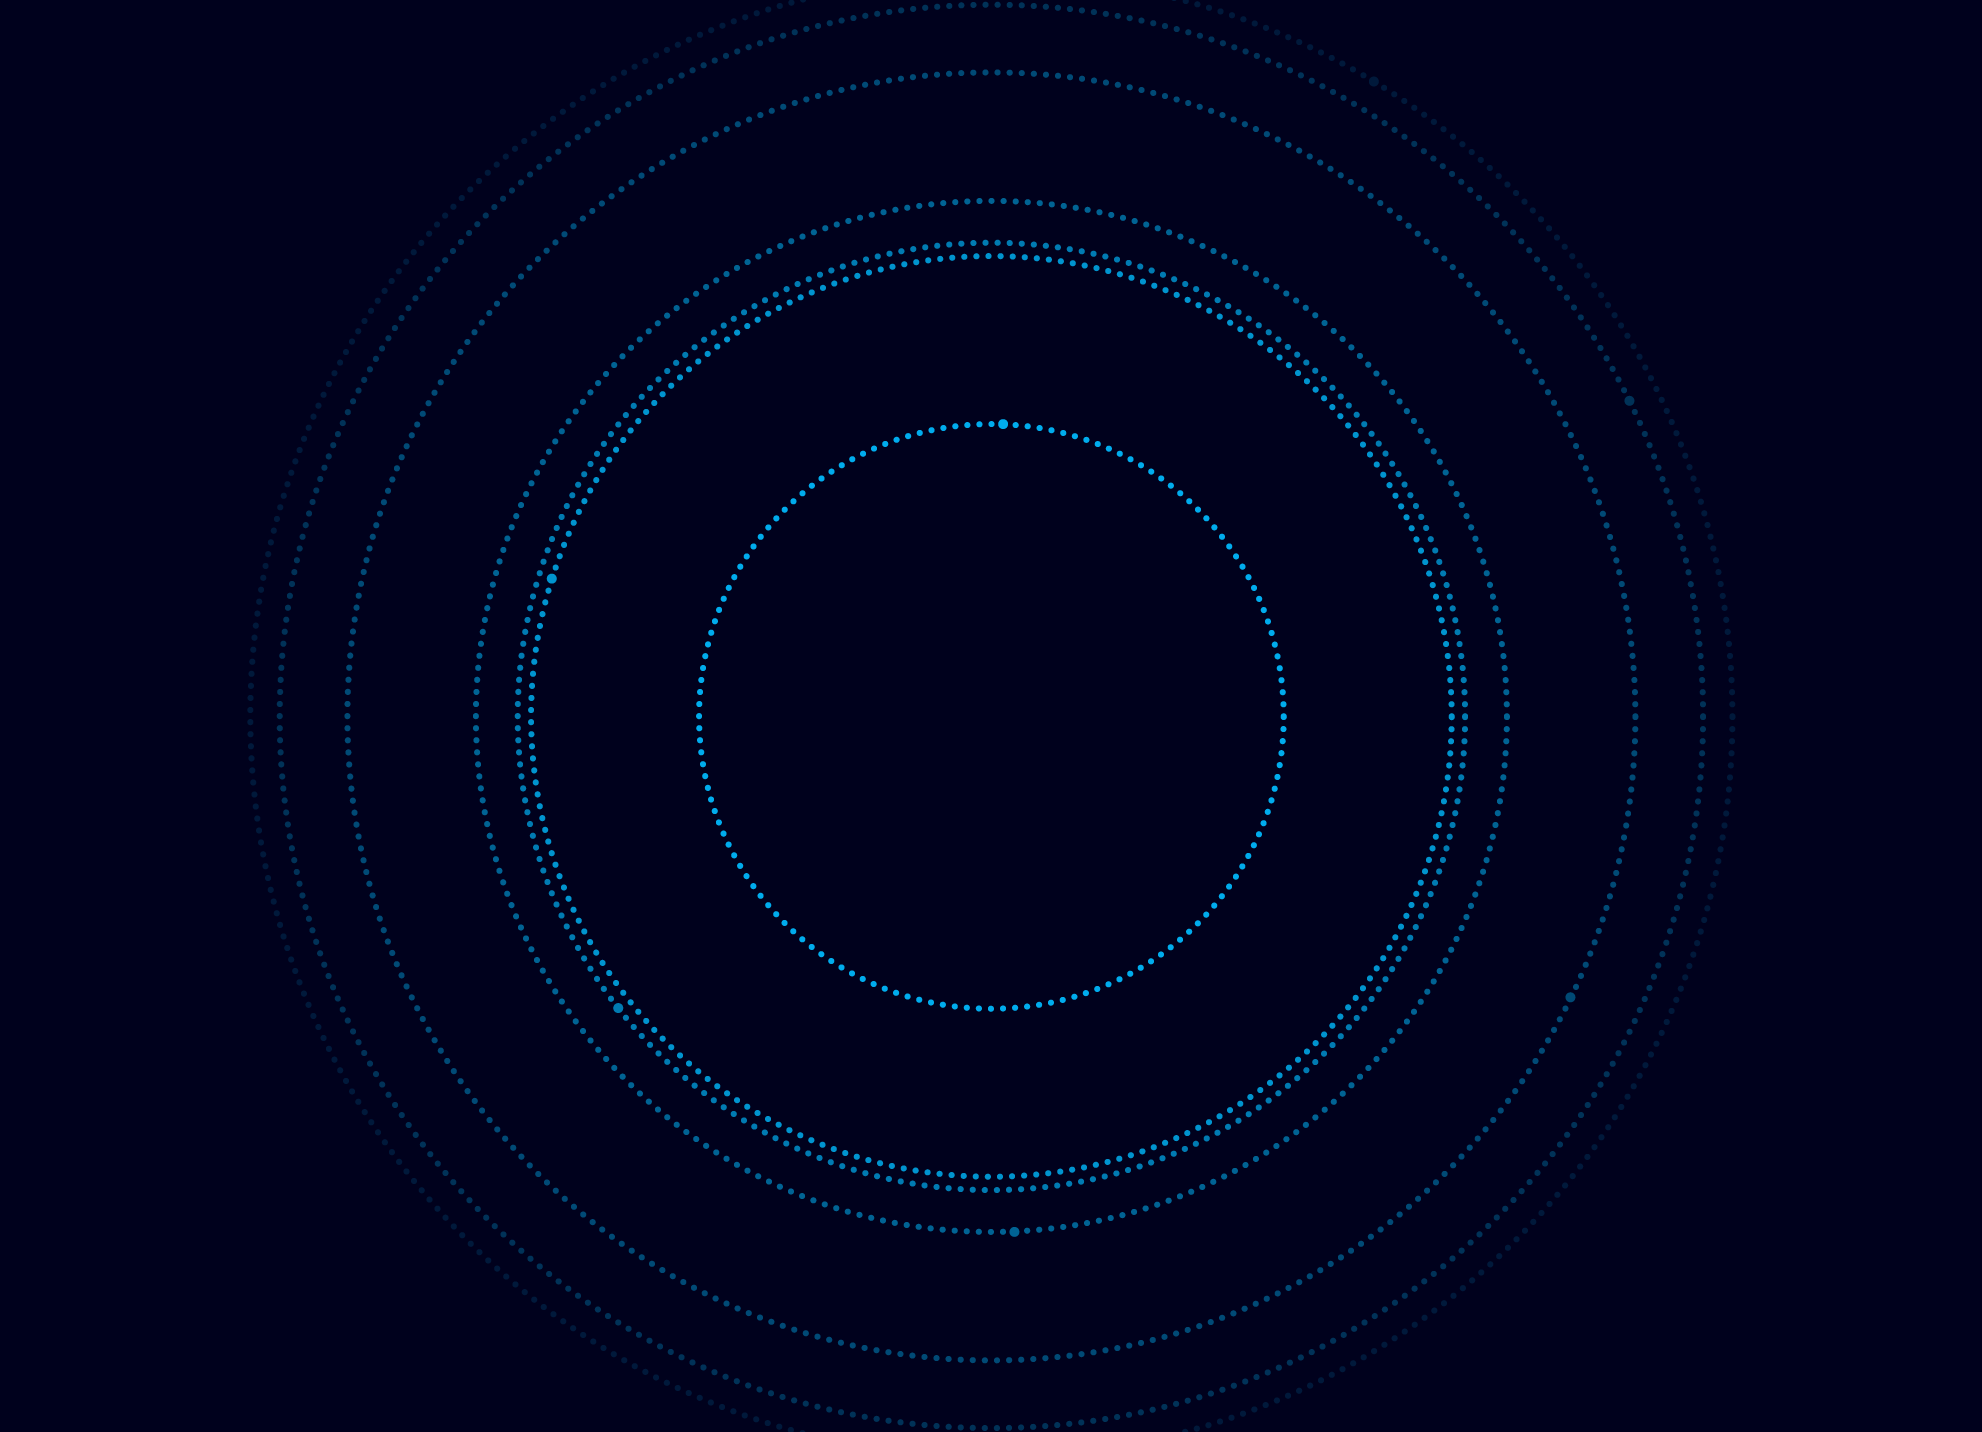 Circles-W18-Web-v1